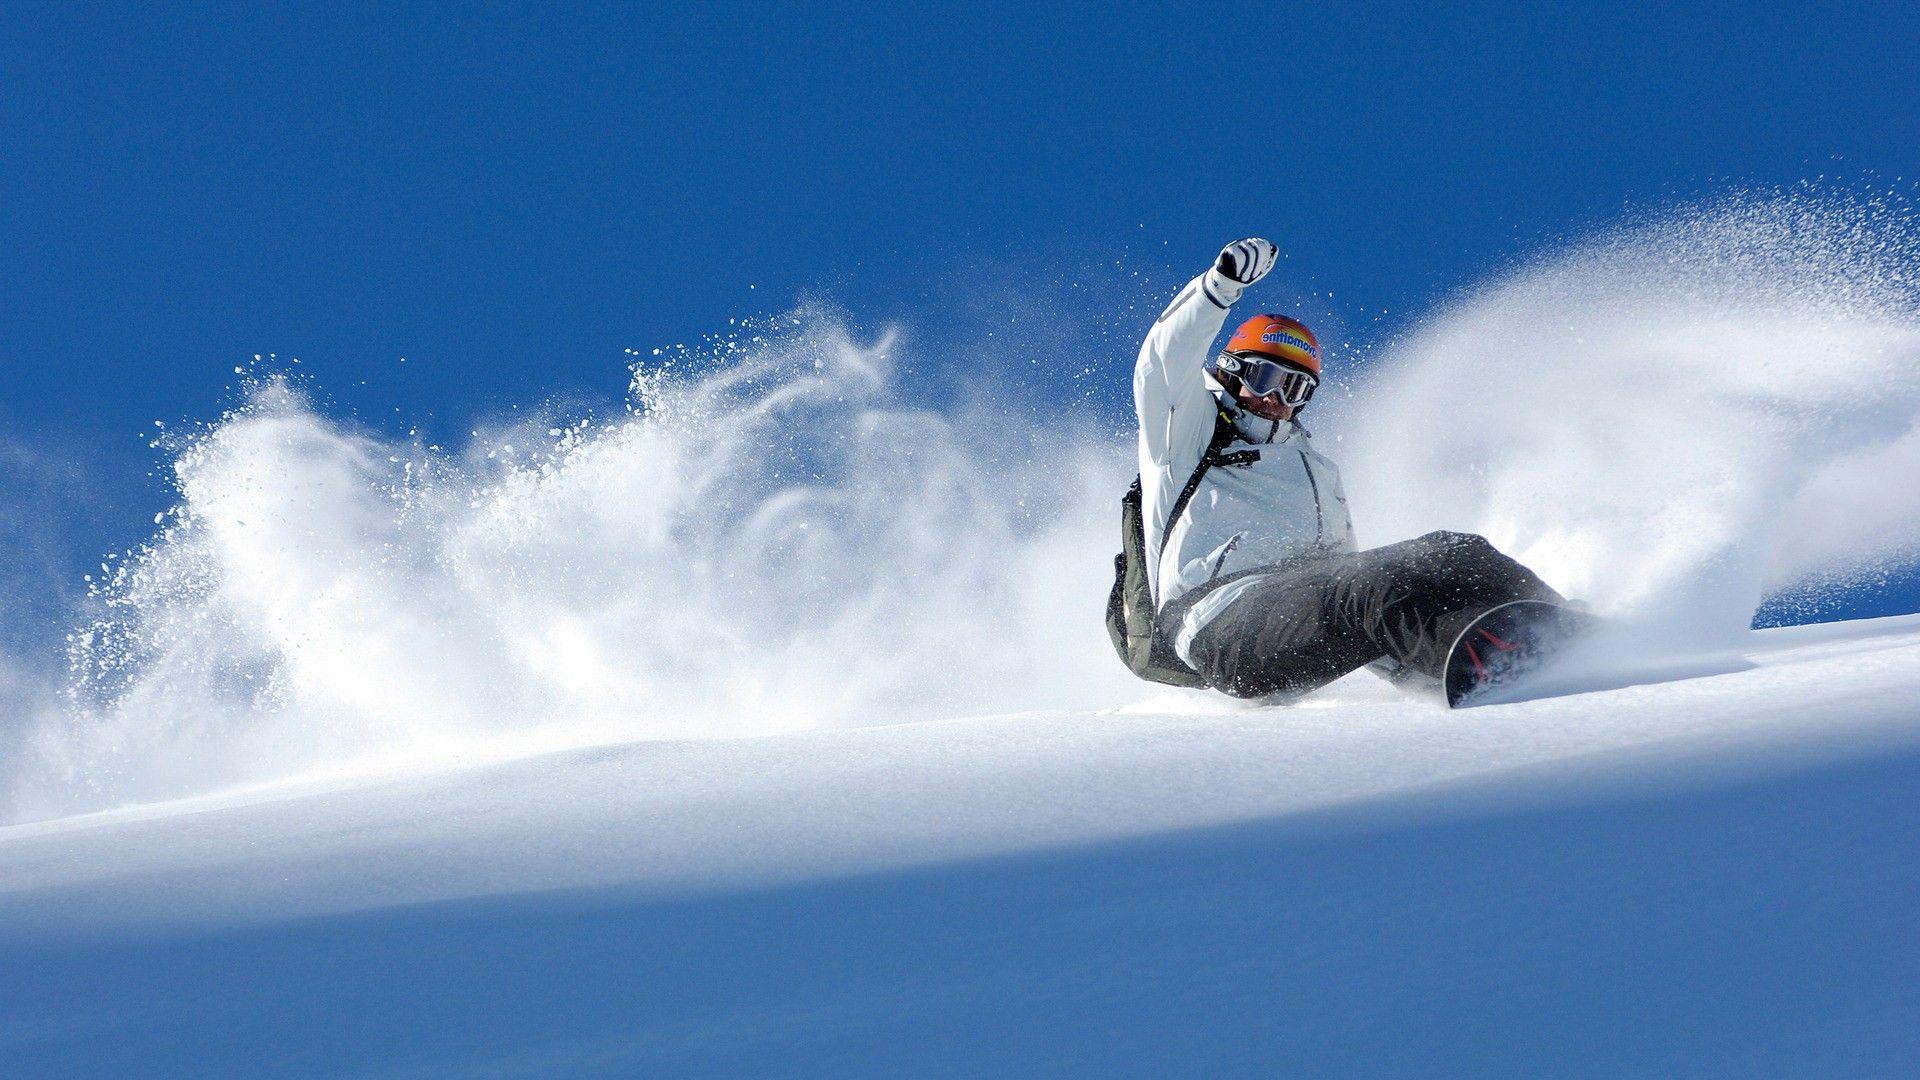 Snowboarding Wallpapers HD Wallpaper Cave Snowboarding